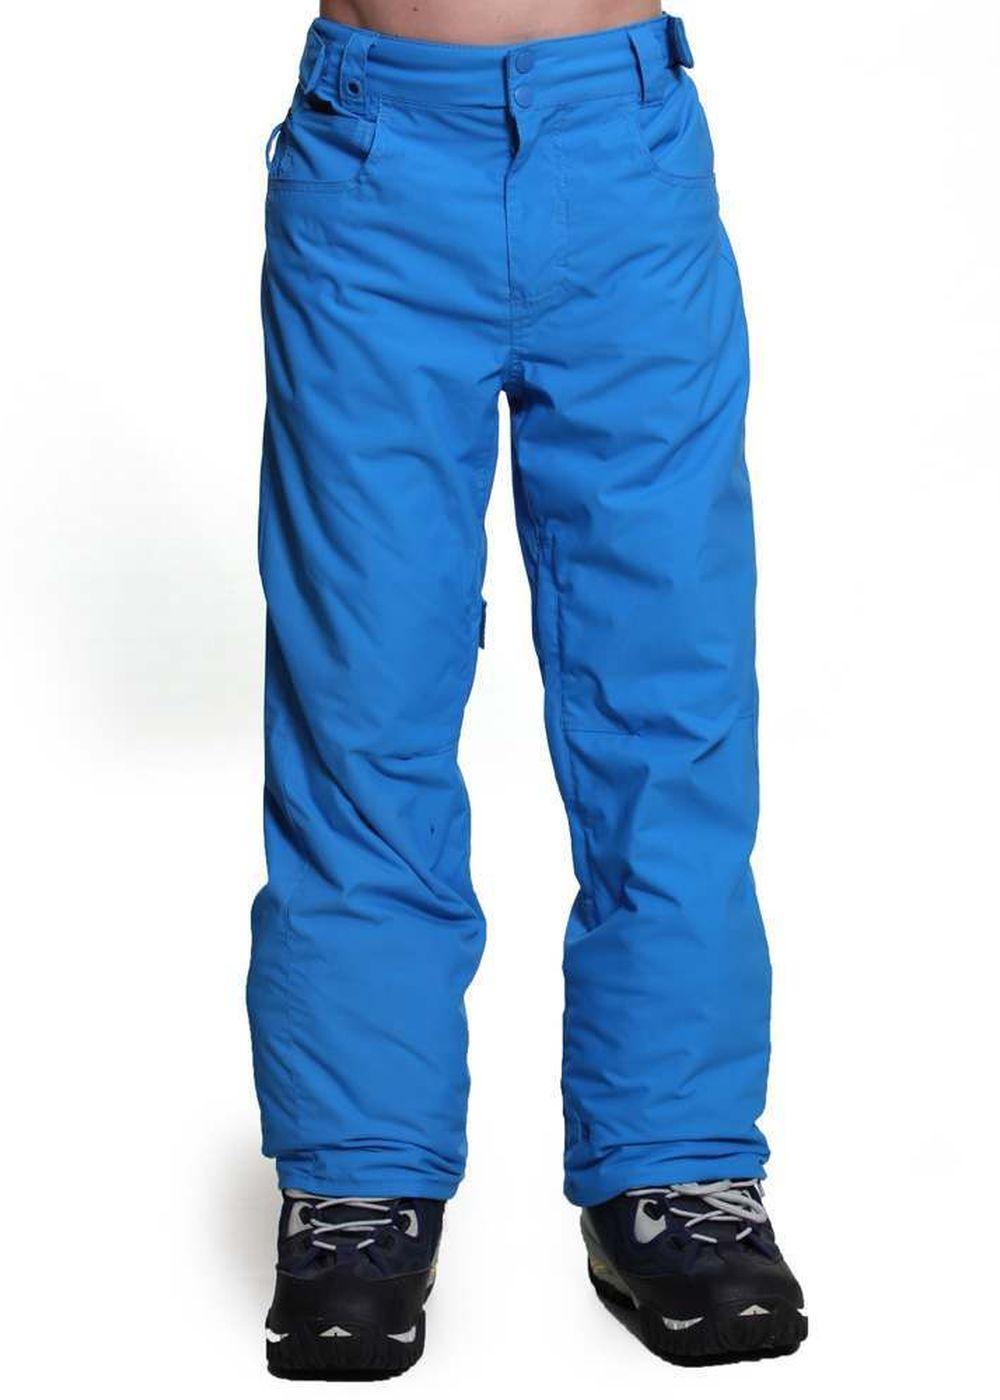 QUIKSILVER BOYS STATE SNOW PANTS Pacific Blue